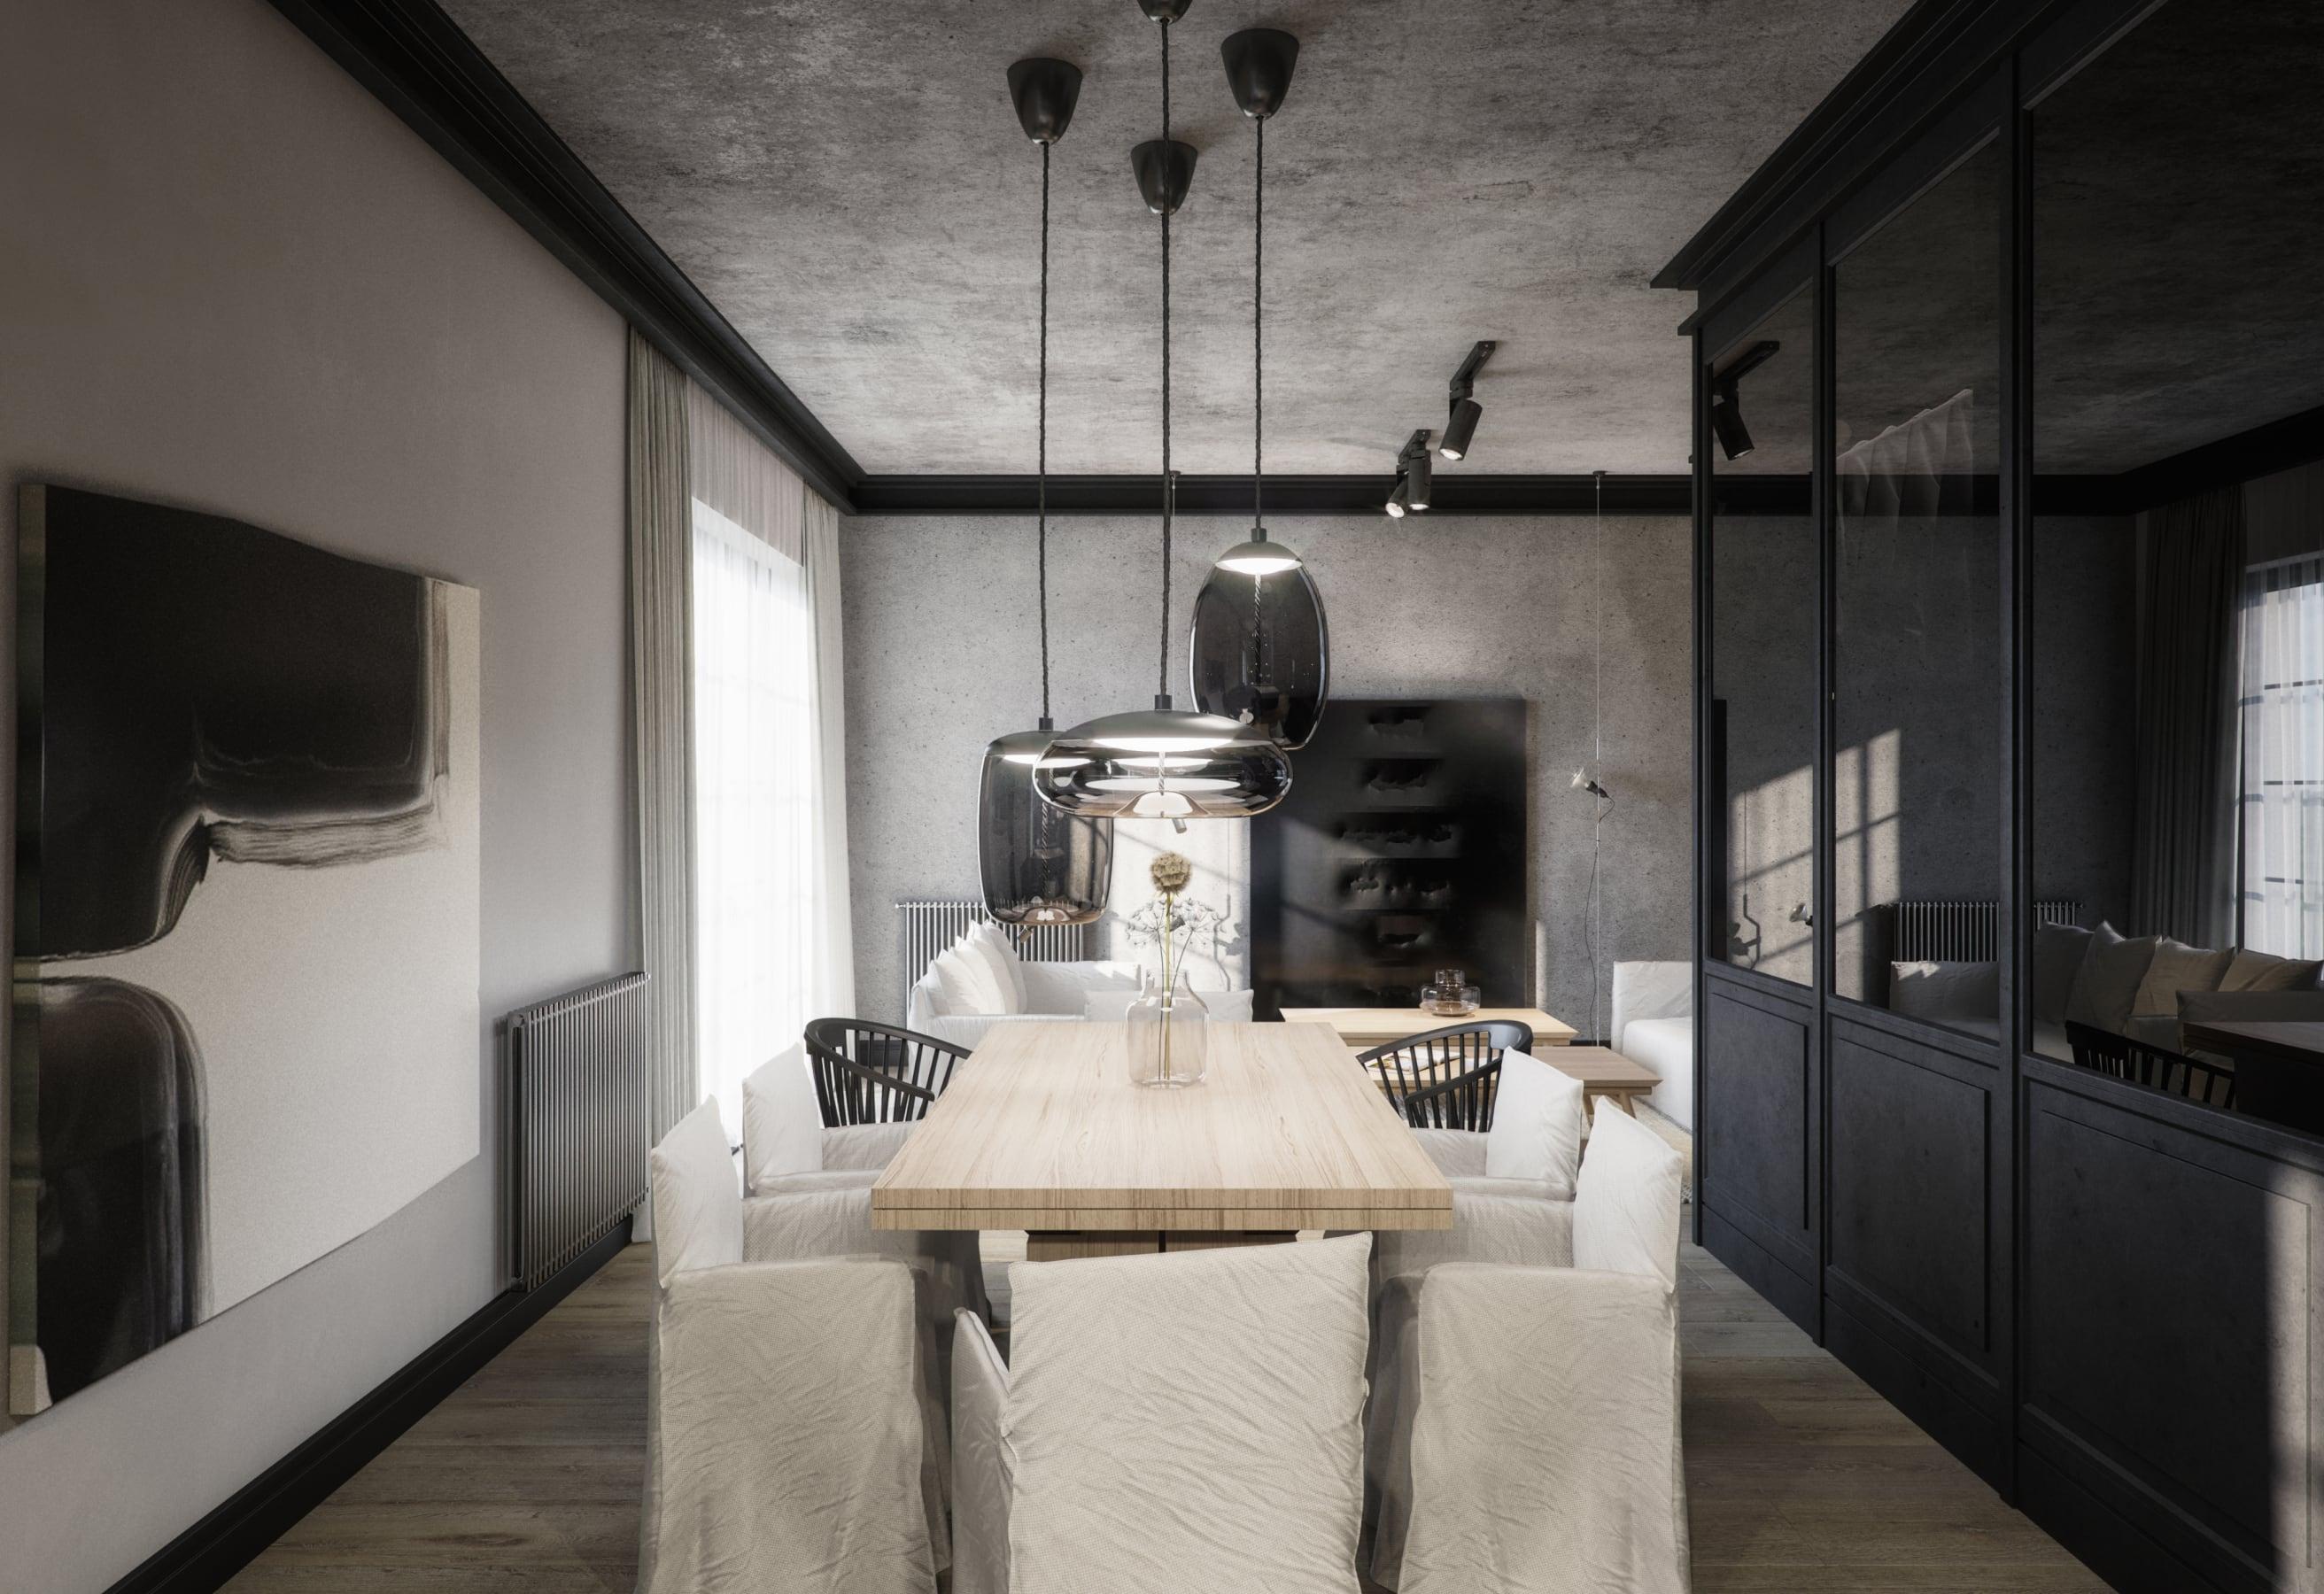 Carbon - Studio Organic, Aga Kobus, Grzegorz Goworek